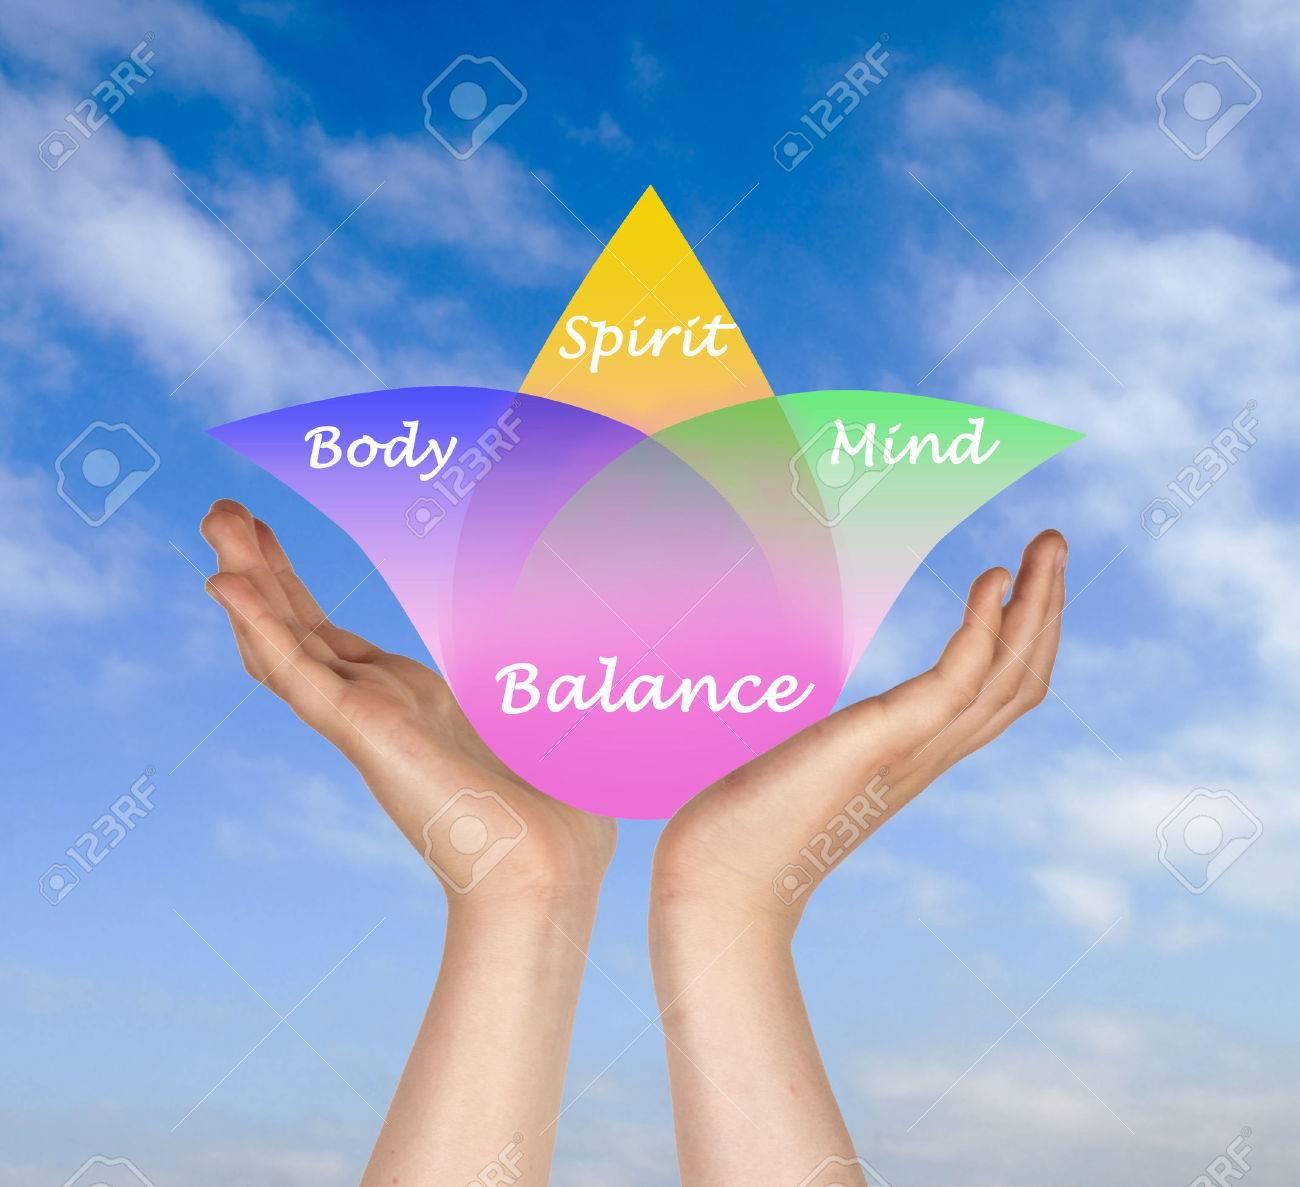 Body, spirit, mind Balance Stock Photo - 25660404